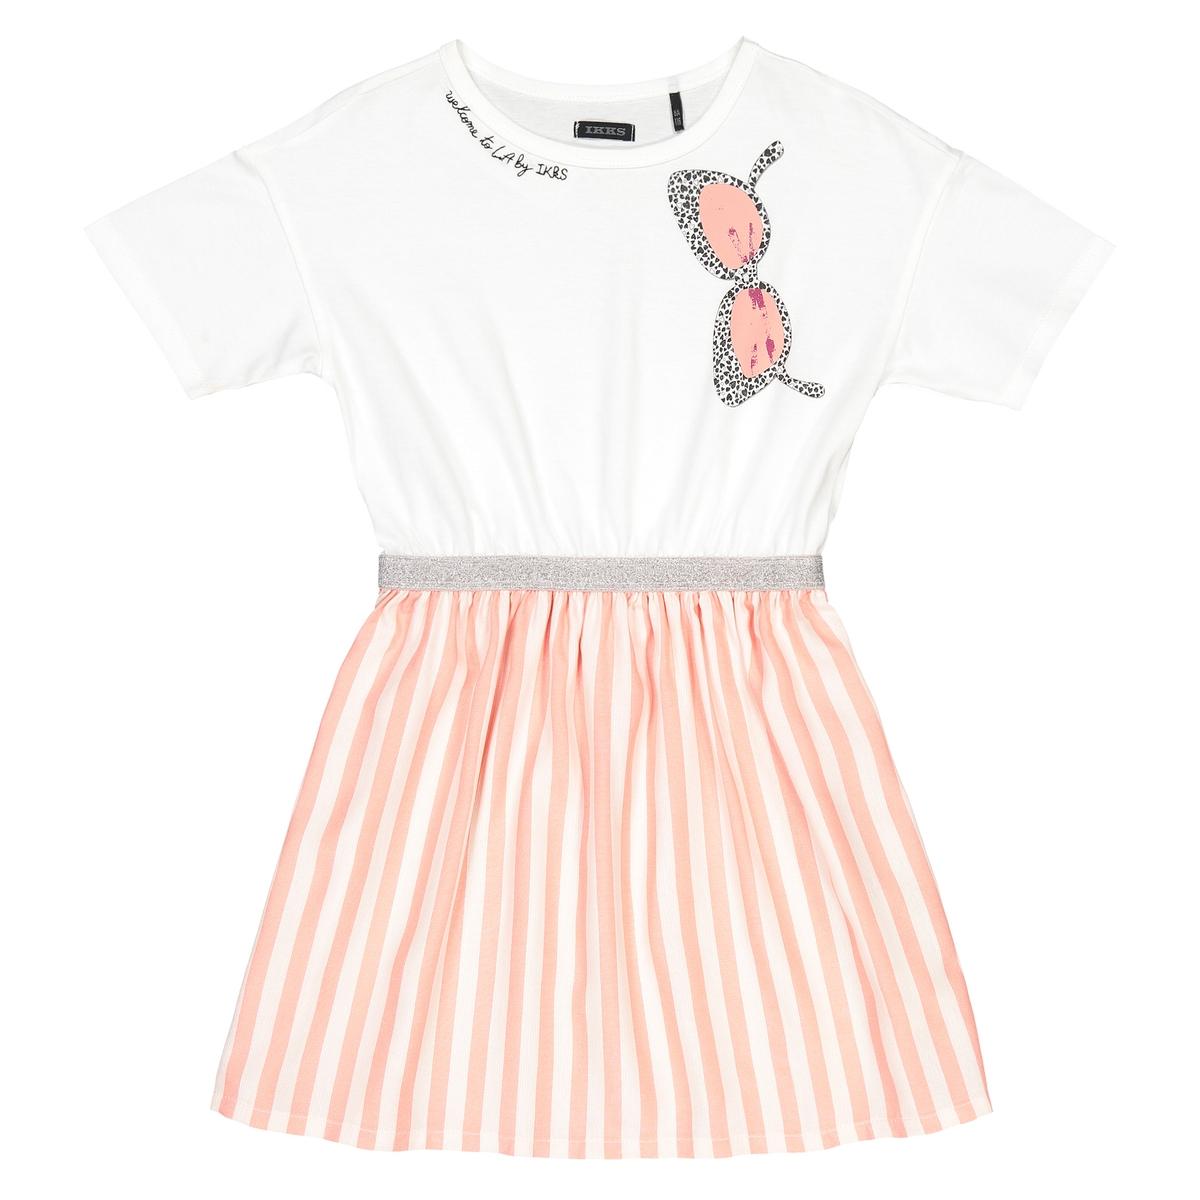 Striped Sunglasses Print Cotton Dress 5 14 Years